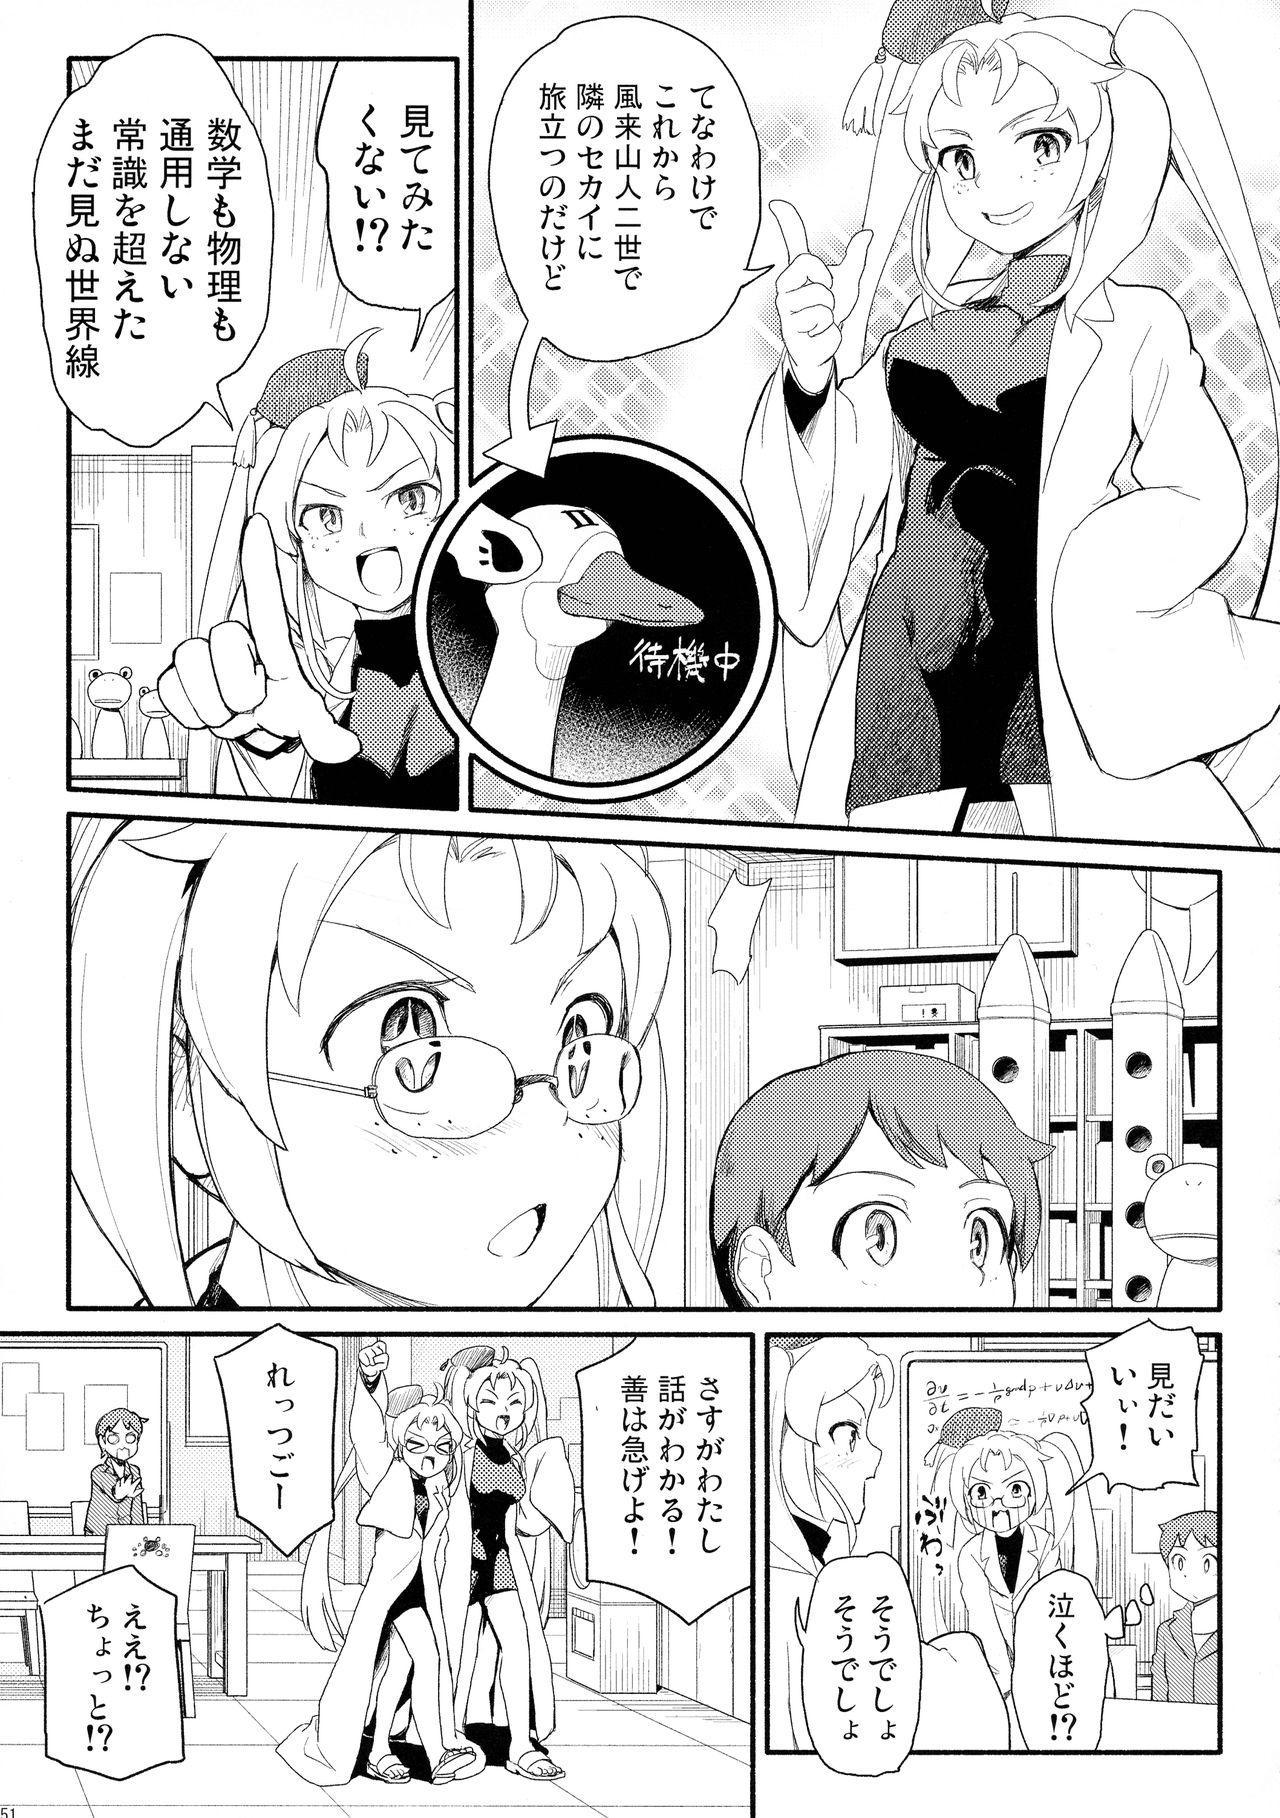 Muhou!! Hiraga Gennai-chan Ecchi Goudoushi 50